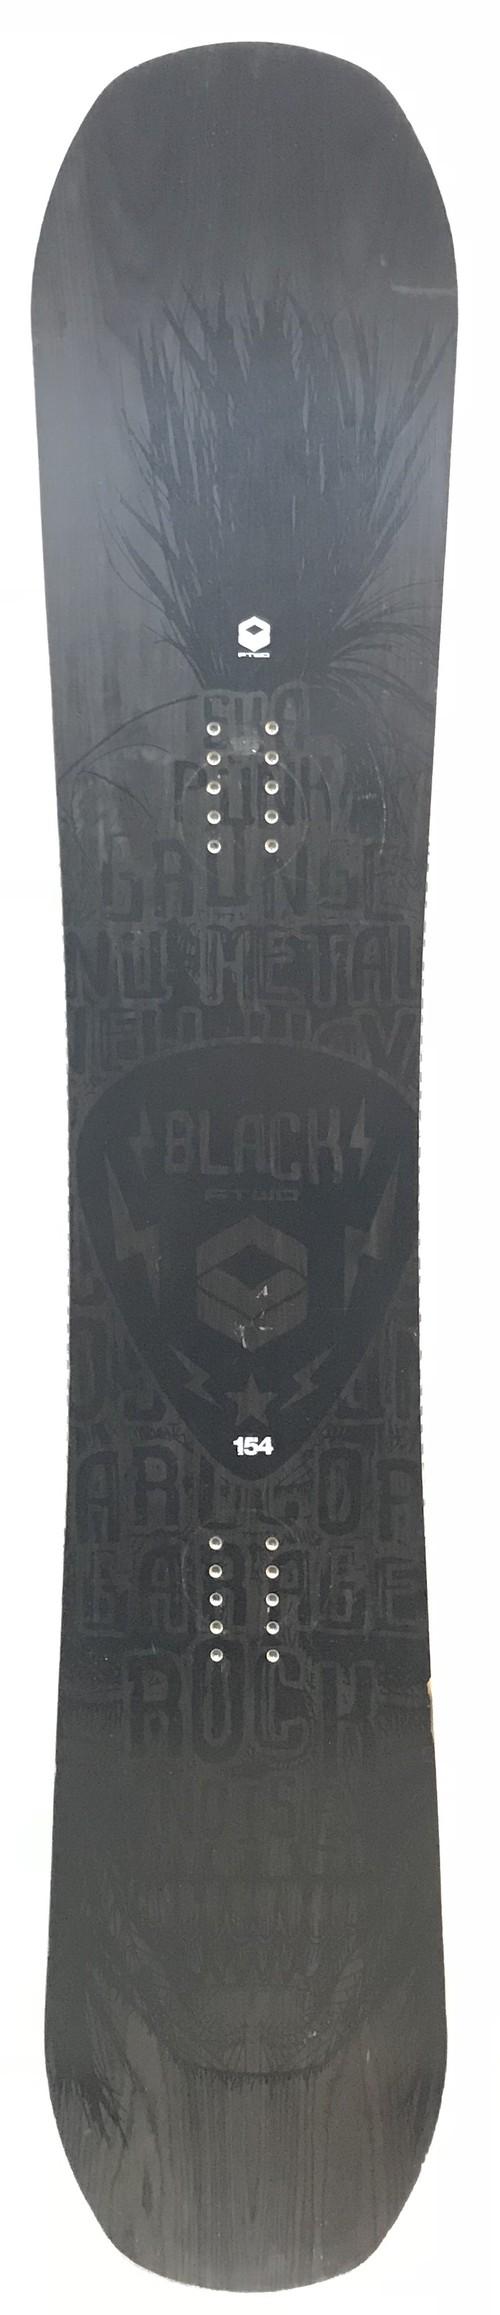 【FTWO-BLACKDECK LTD 154】1ヶ月レンタルプラン